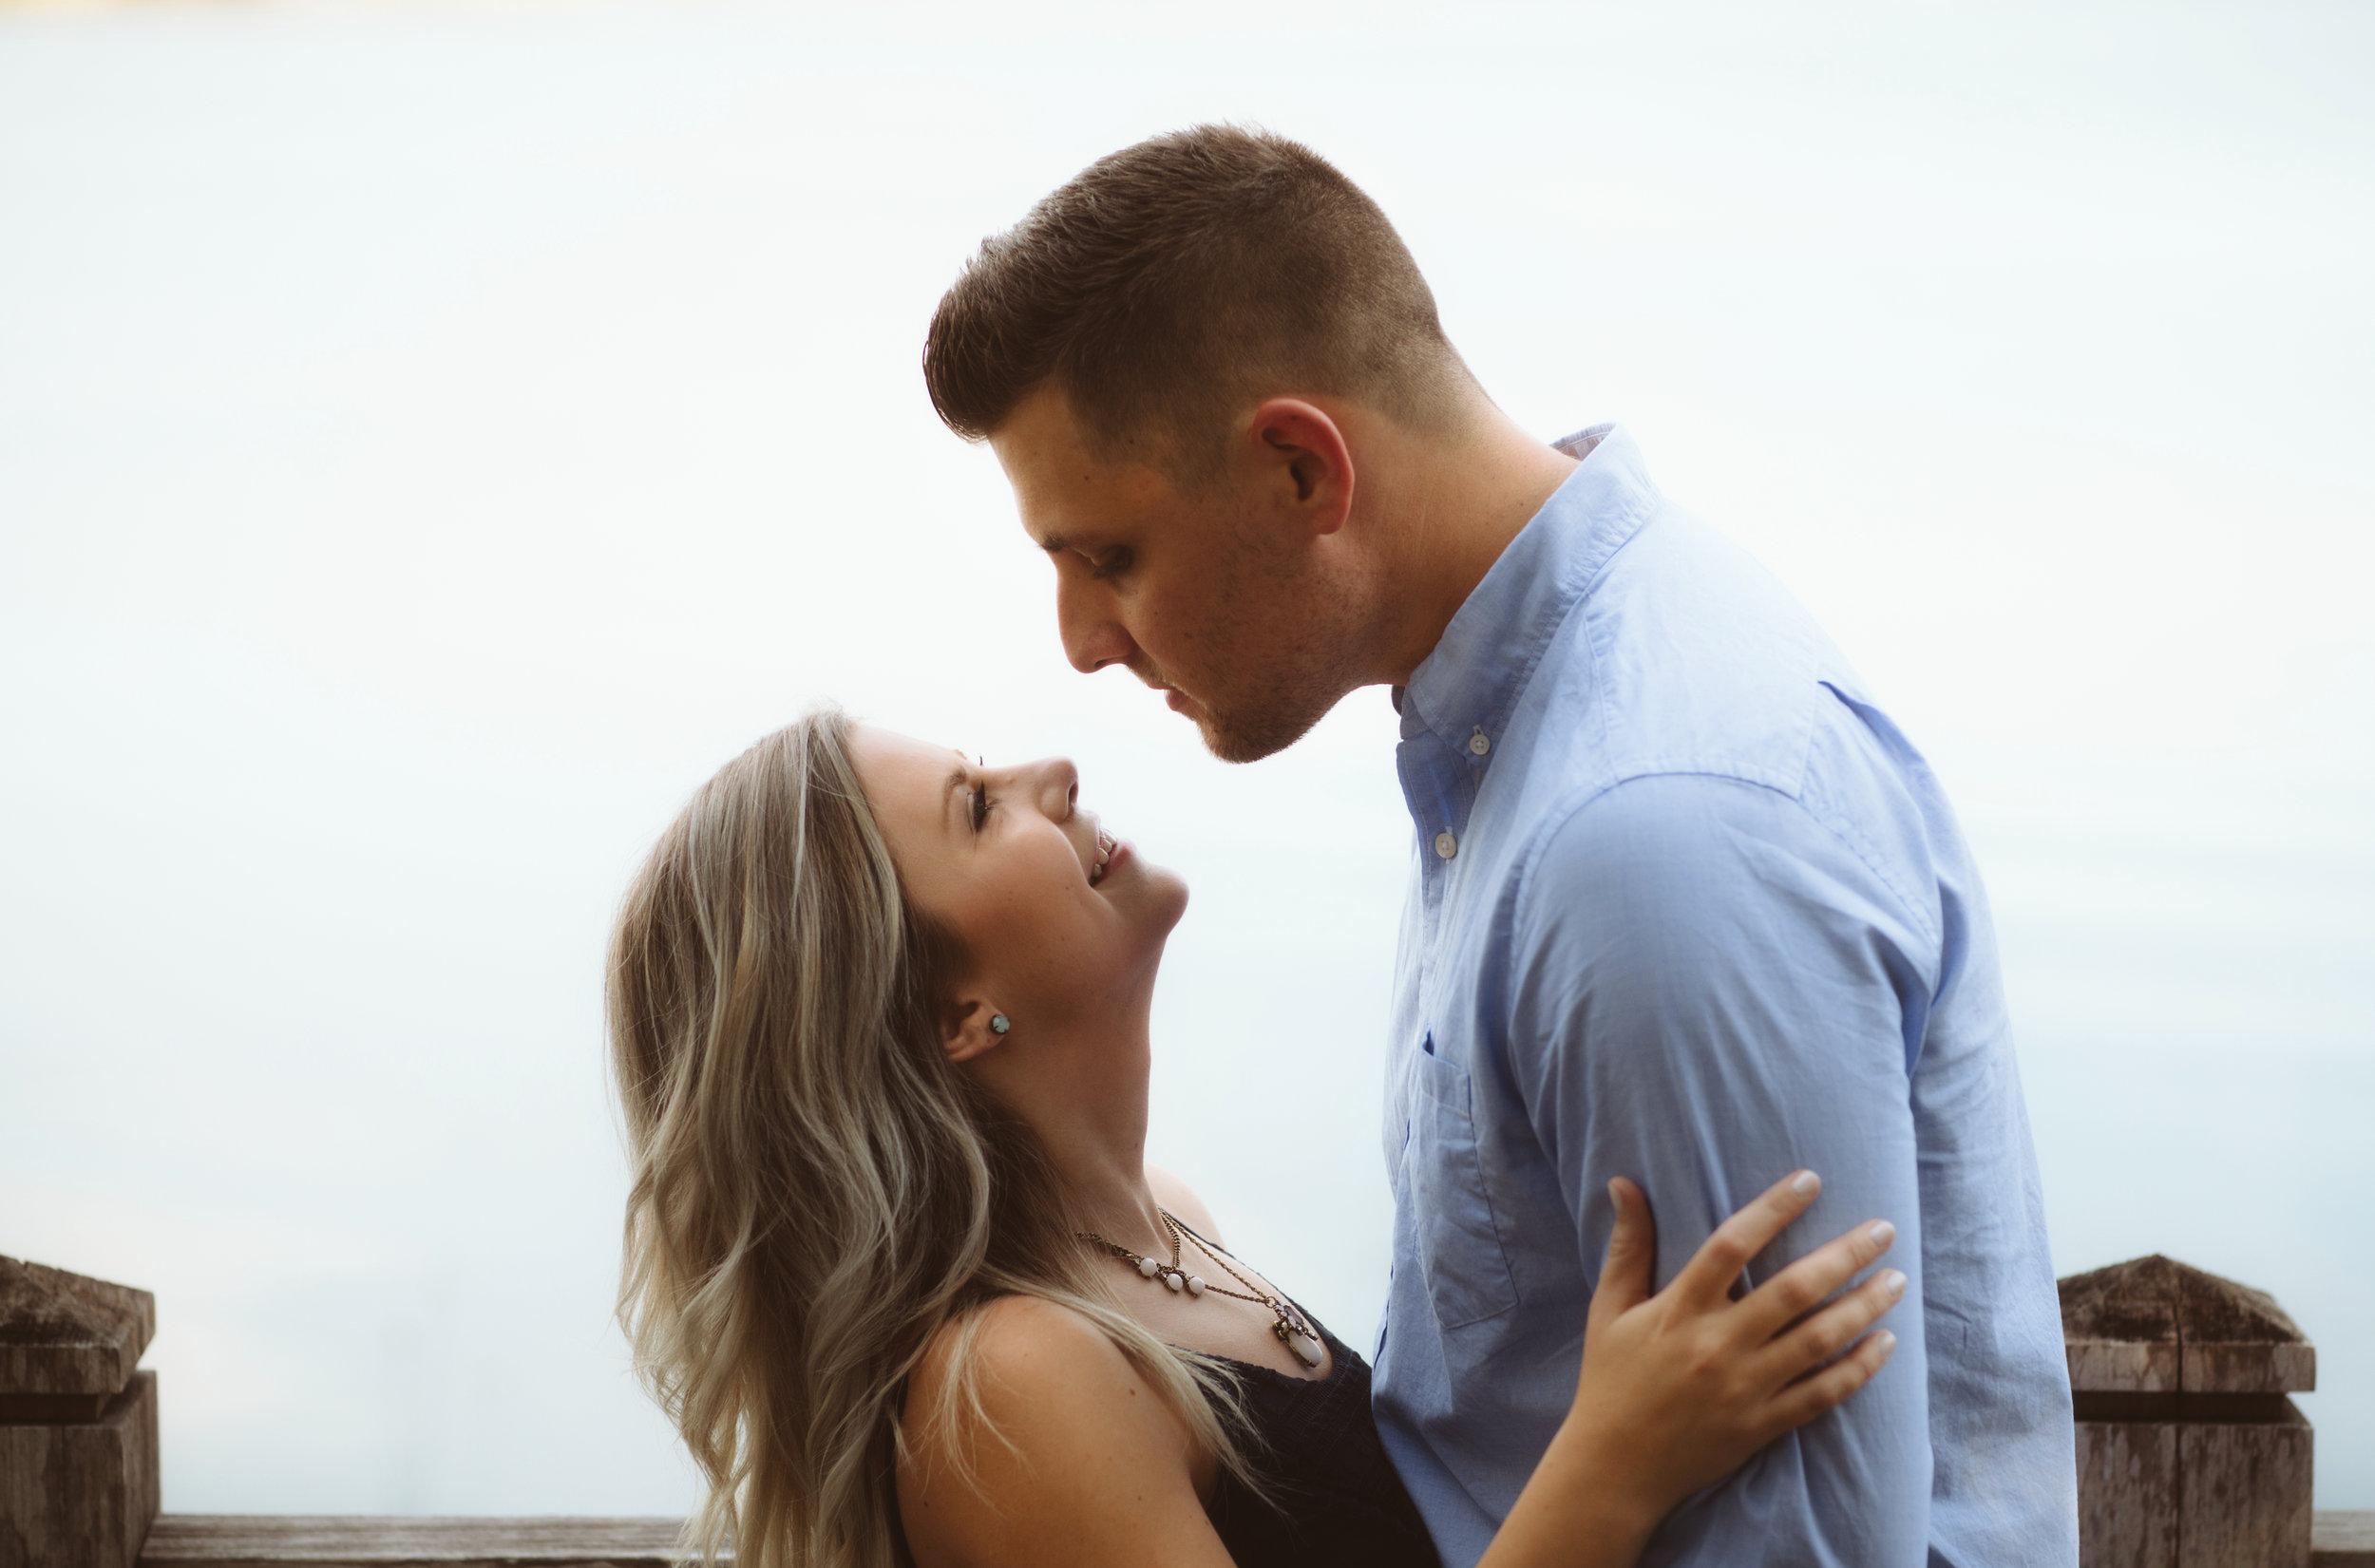 Engagement | Vanessa Boy Photography | vanessaboy.com |-42-2.com |final .jpg